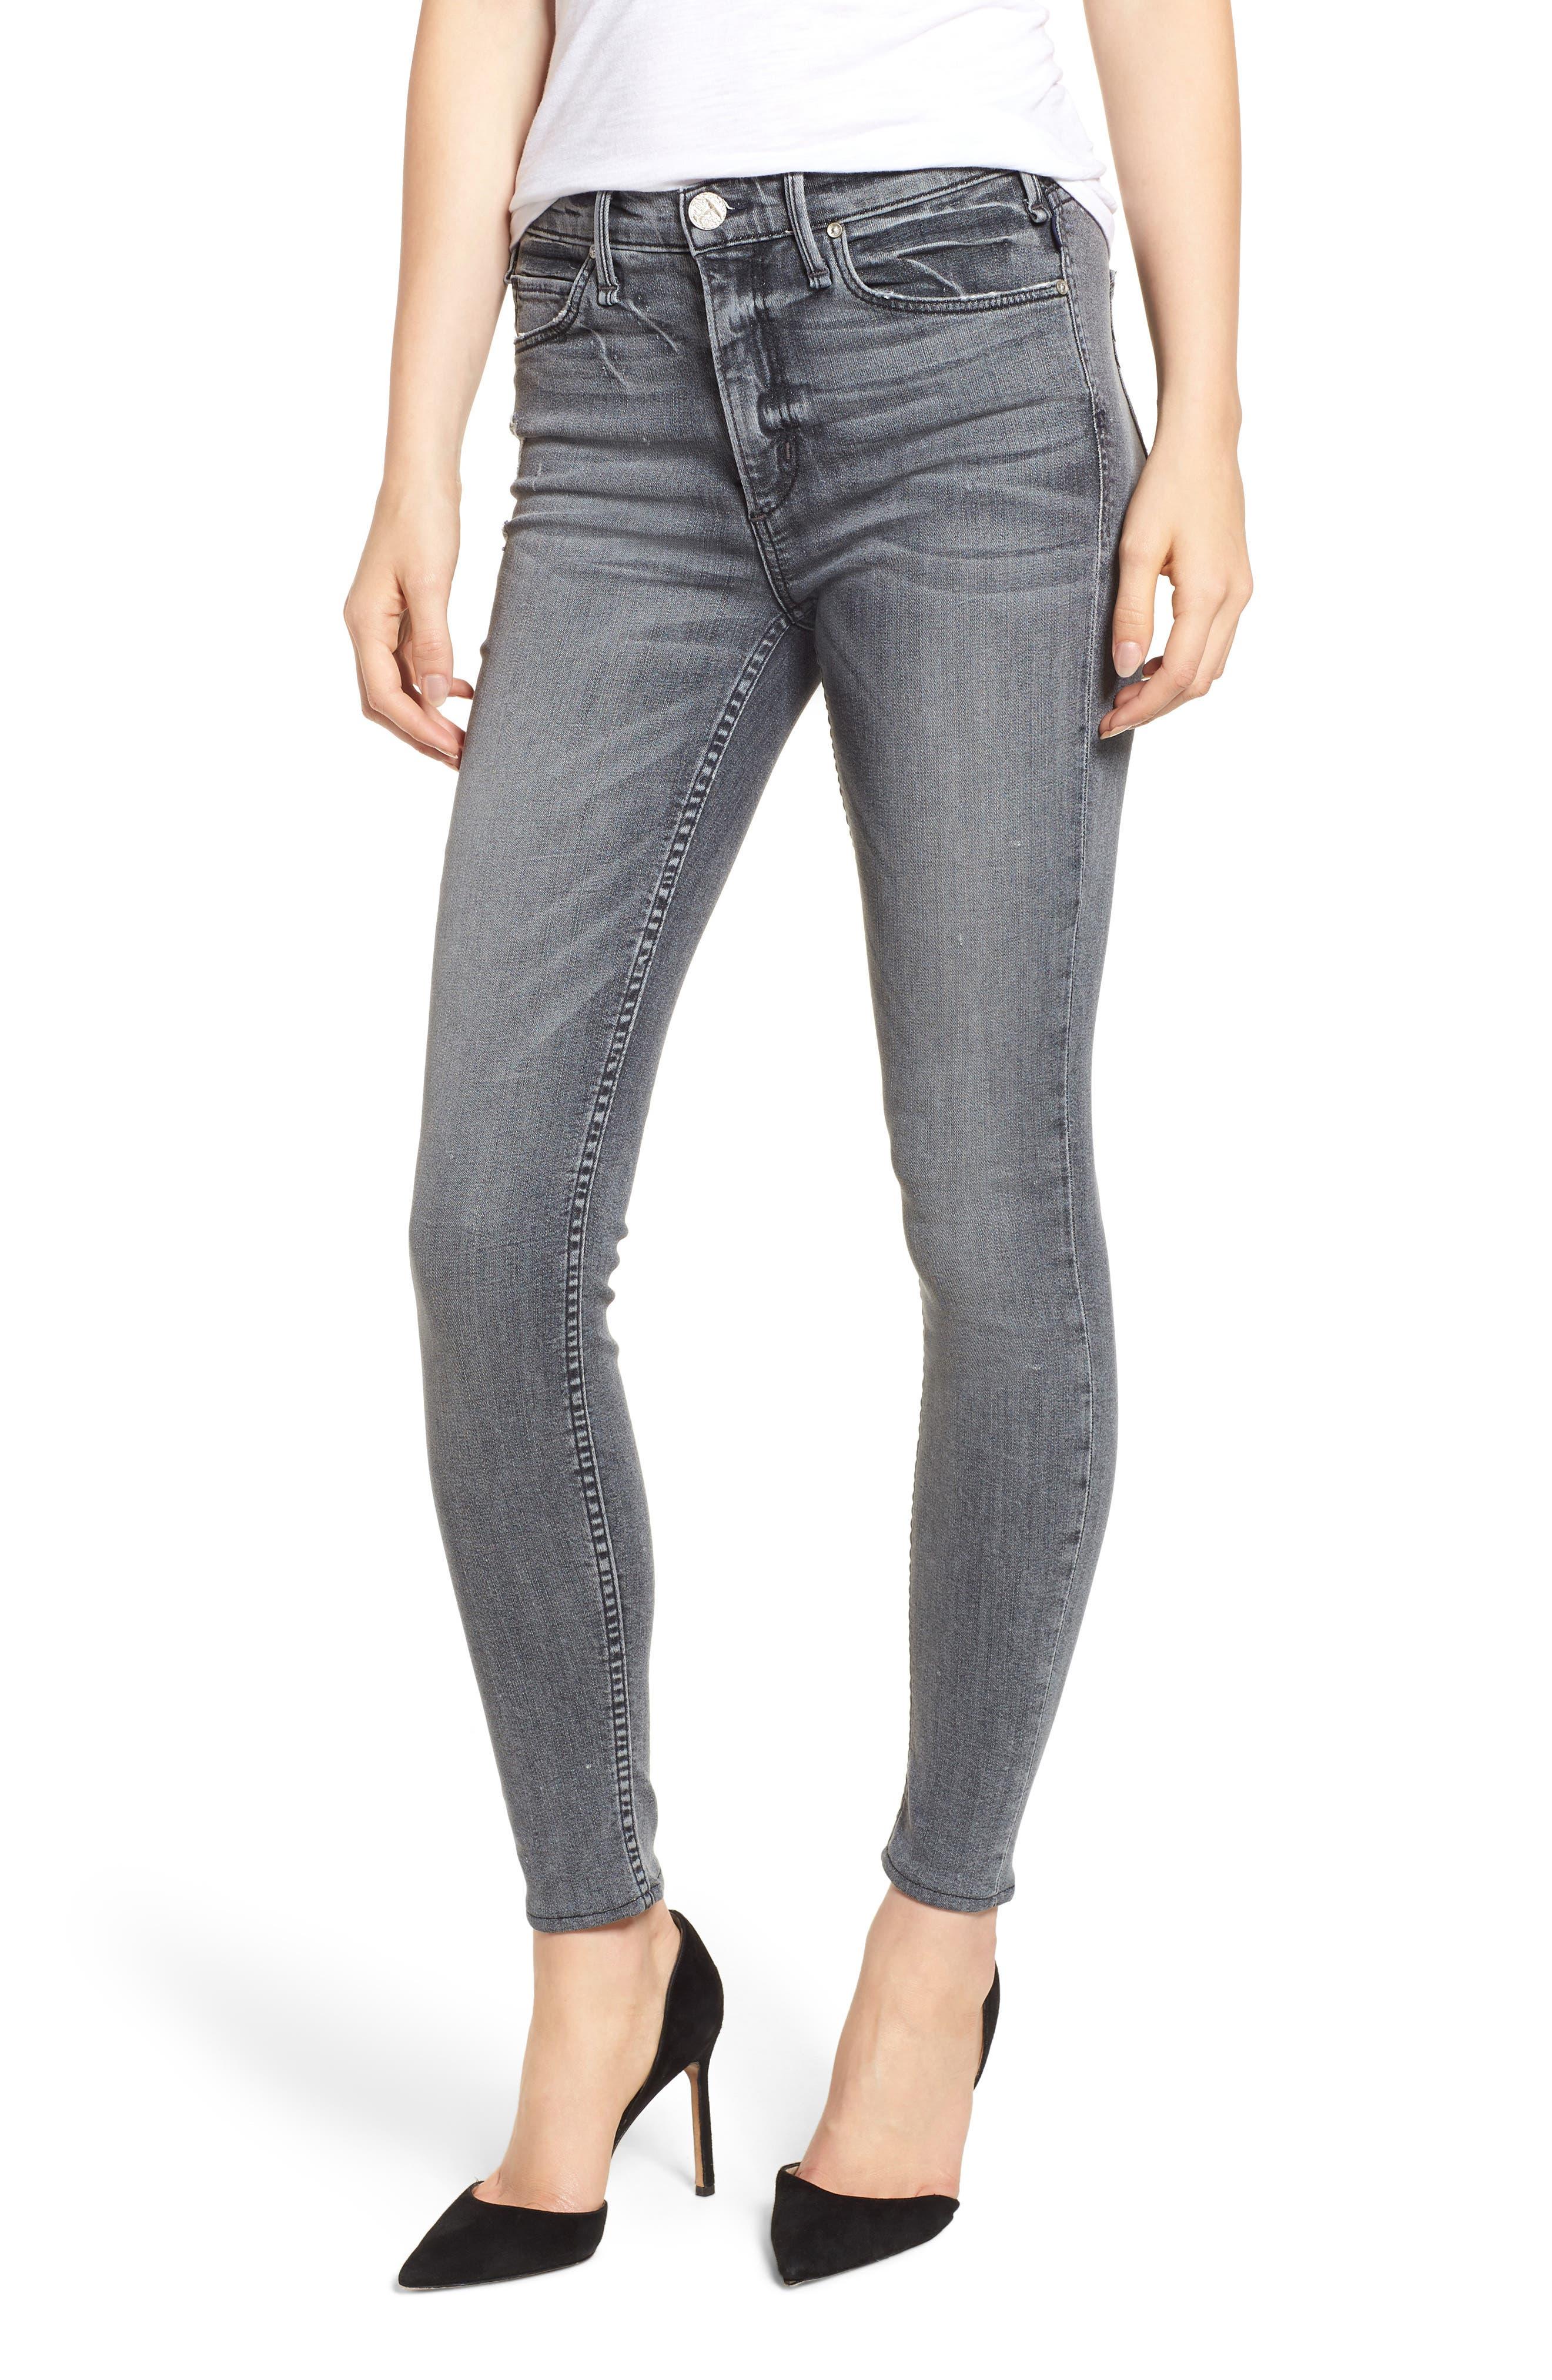 Newton High Waist Skinny Jeans,                         Main,                         color, 021